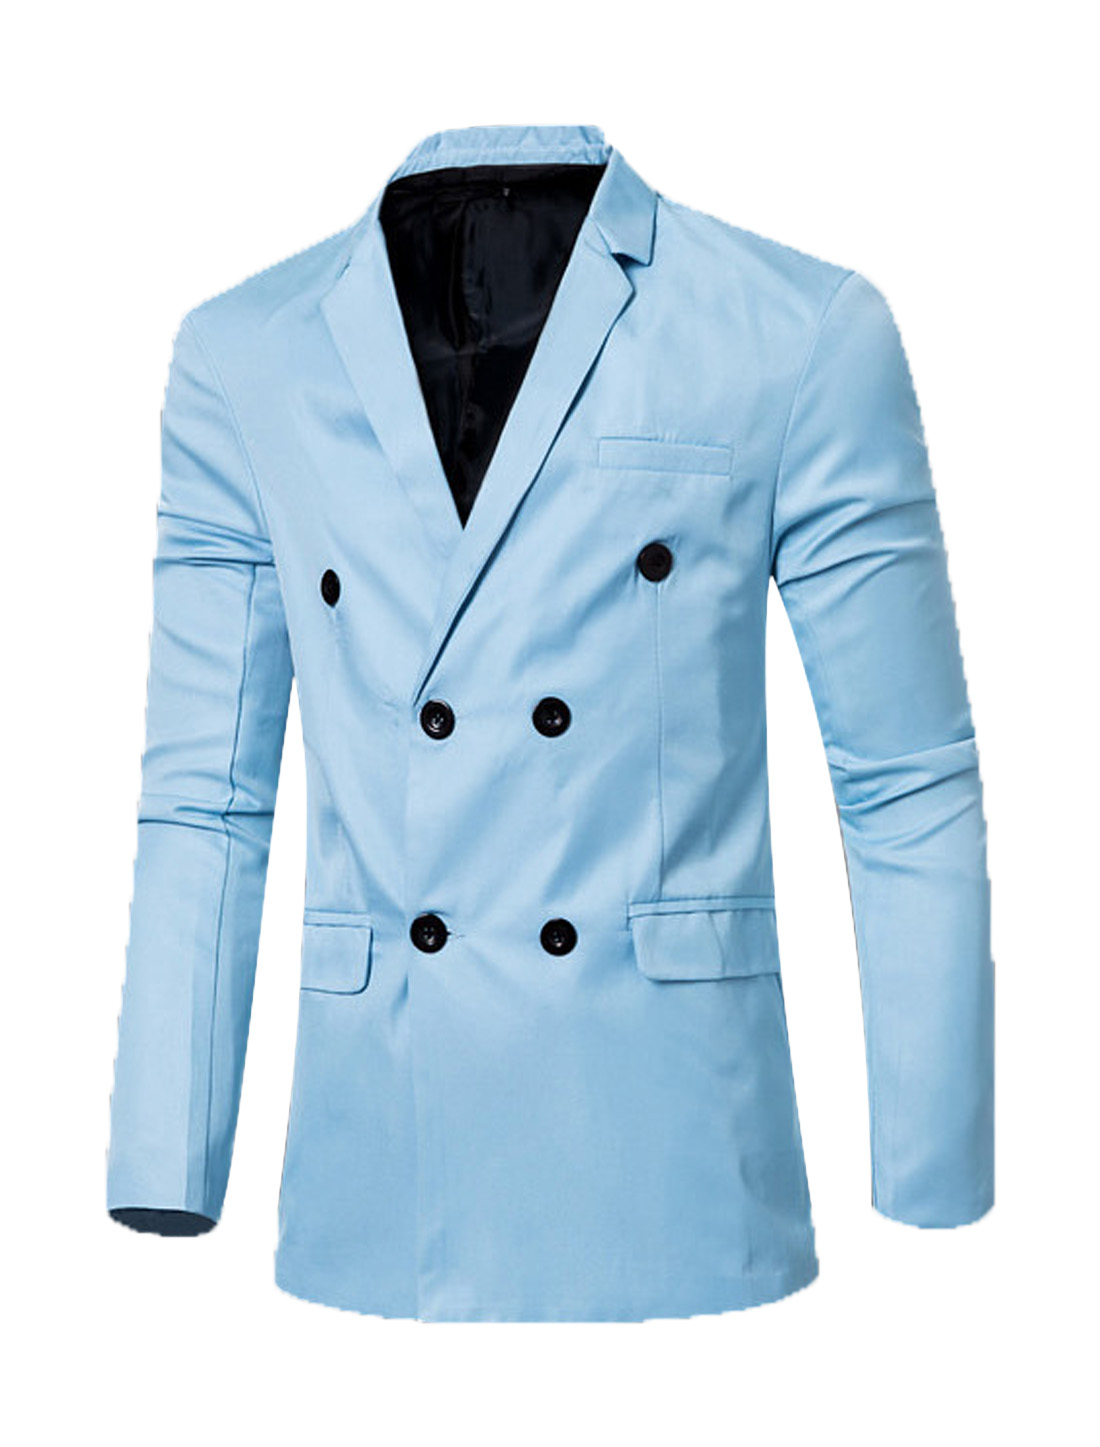 Men Notched Lapel Flap Pockets Double Breasted Blazer Sky Blue M